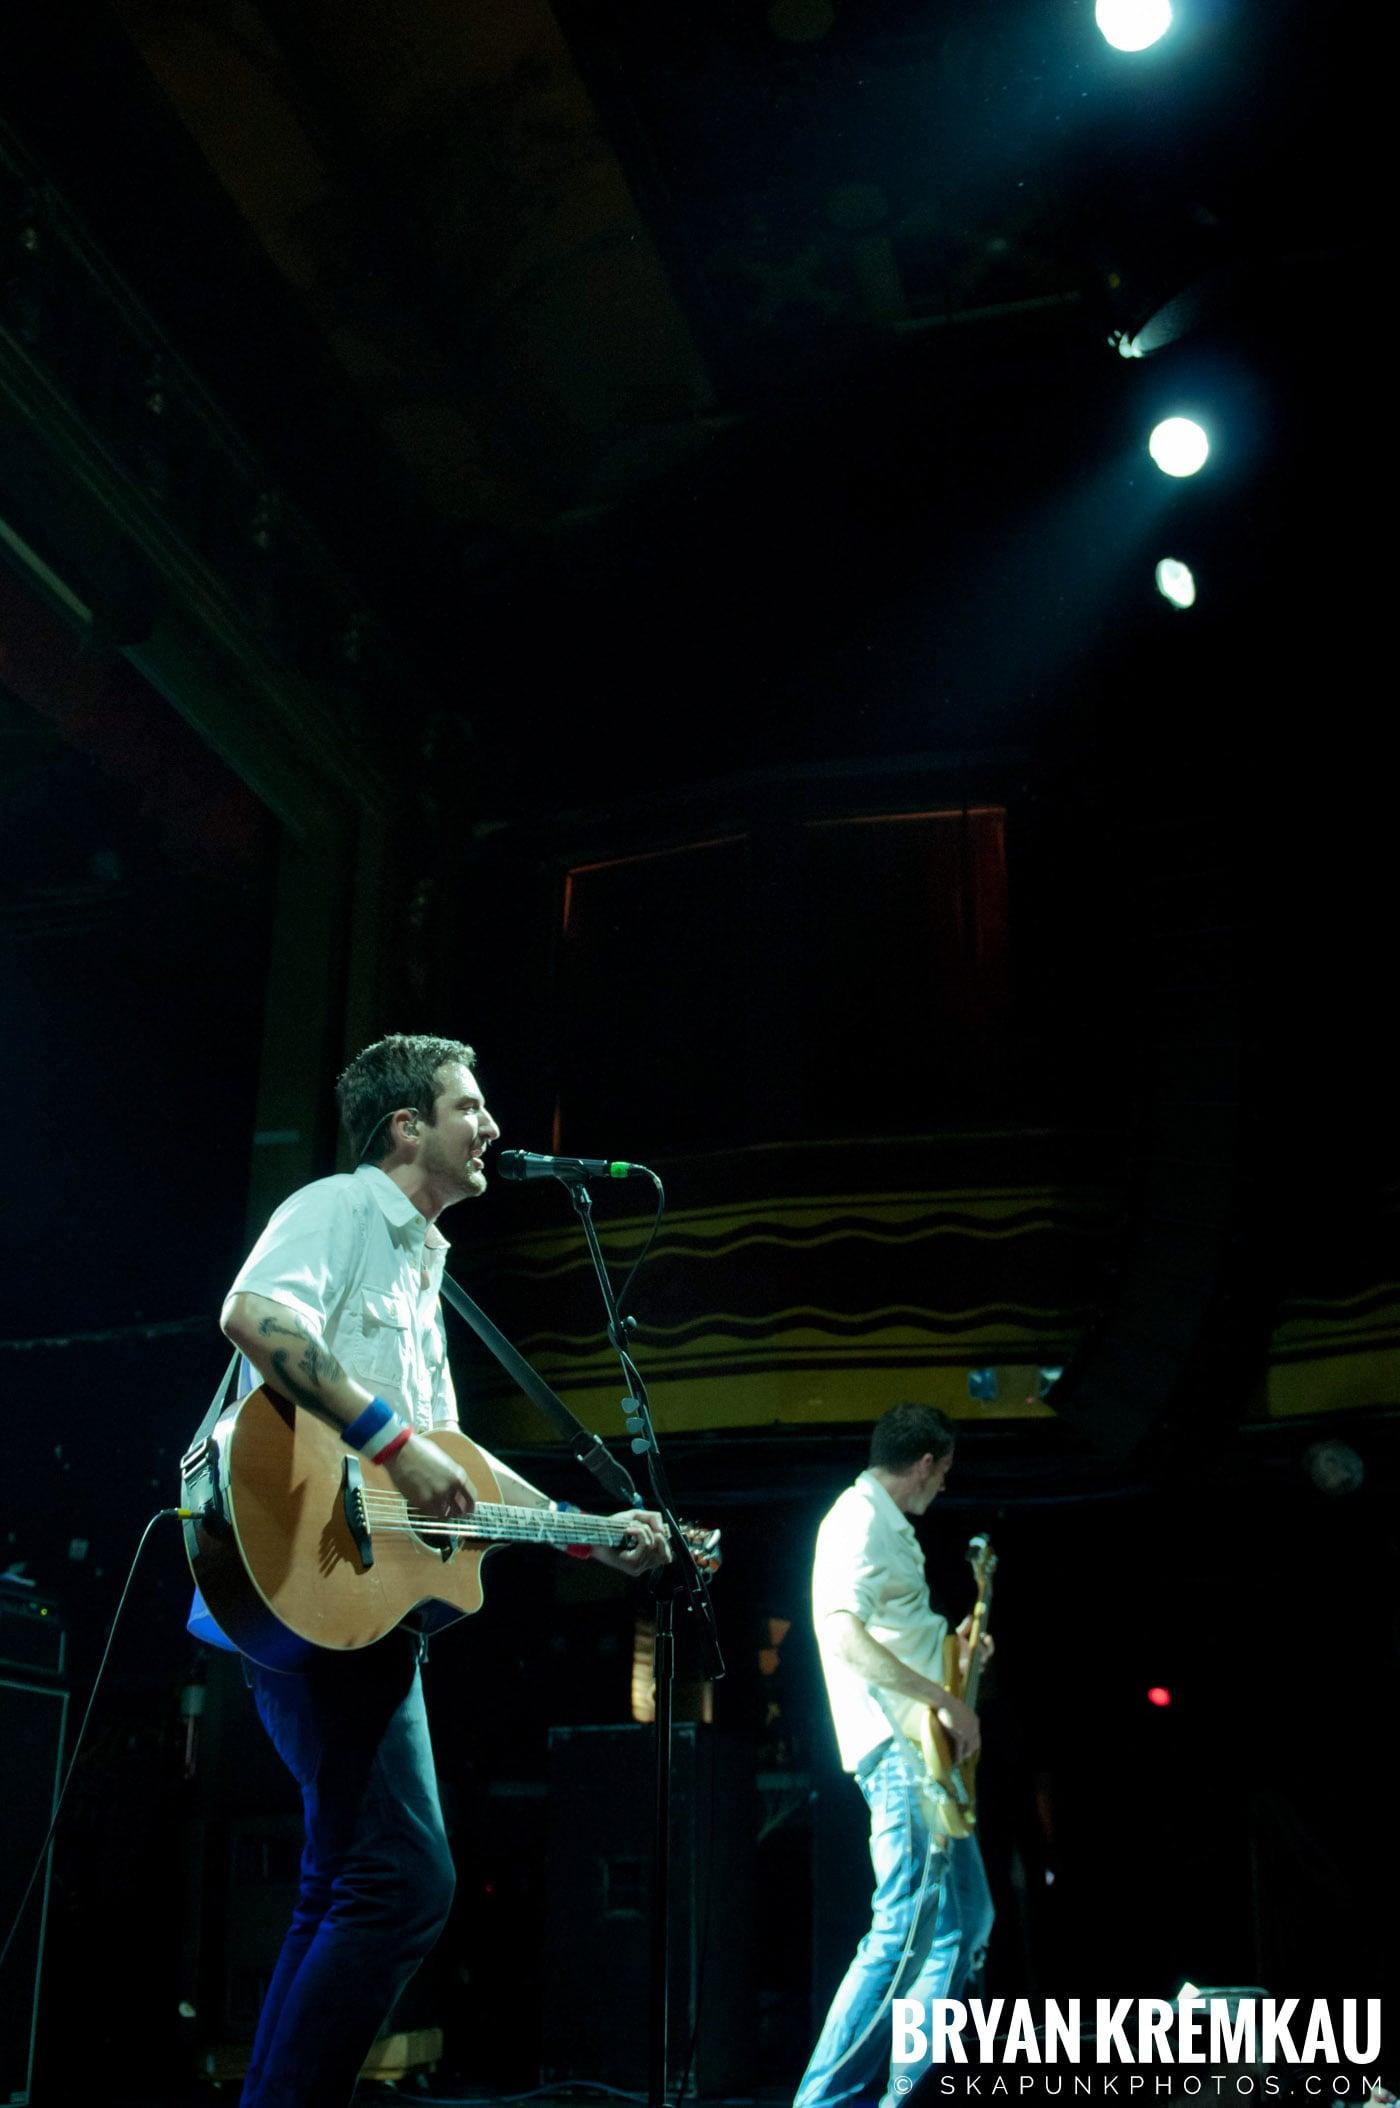 Frank Turner & The Sleeping Souls @ Webster Hall, NYC - 9.29.12 (21)